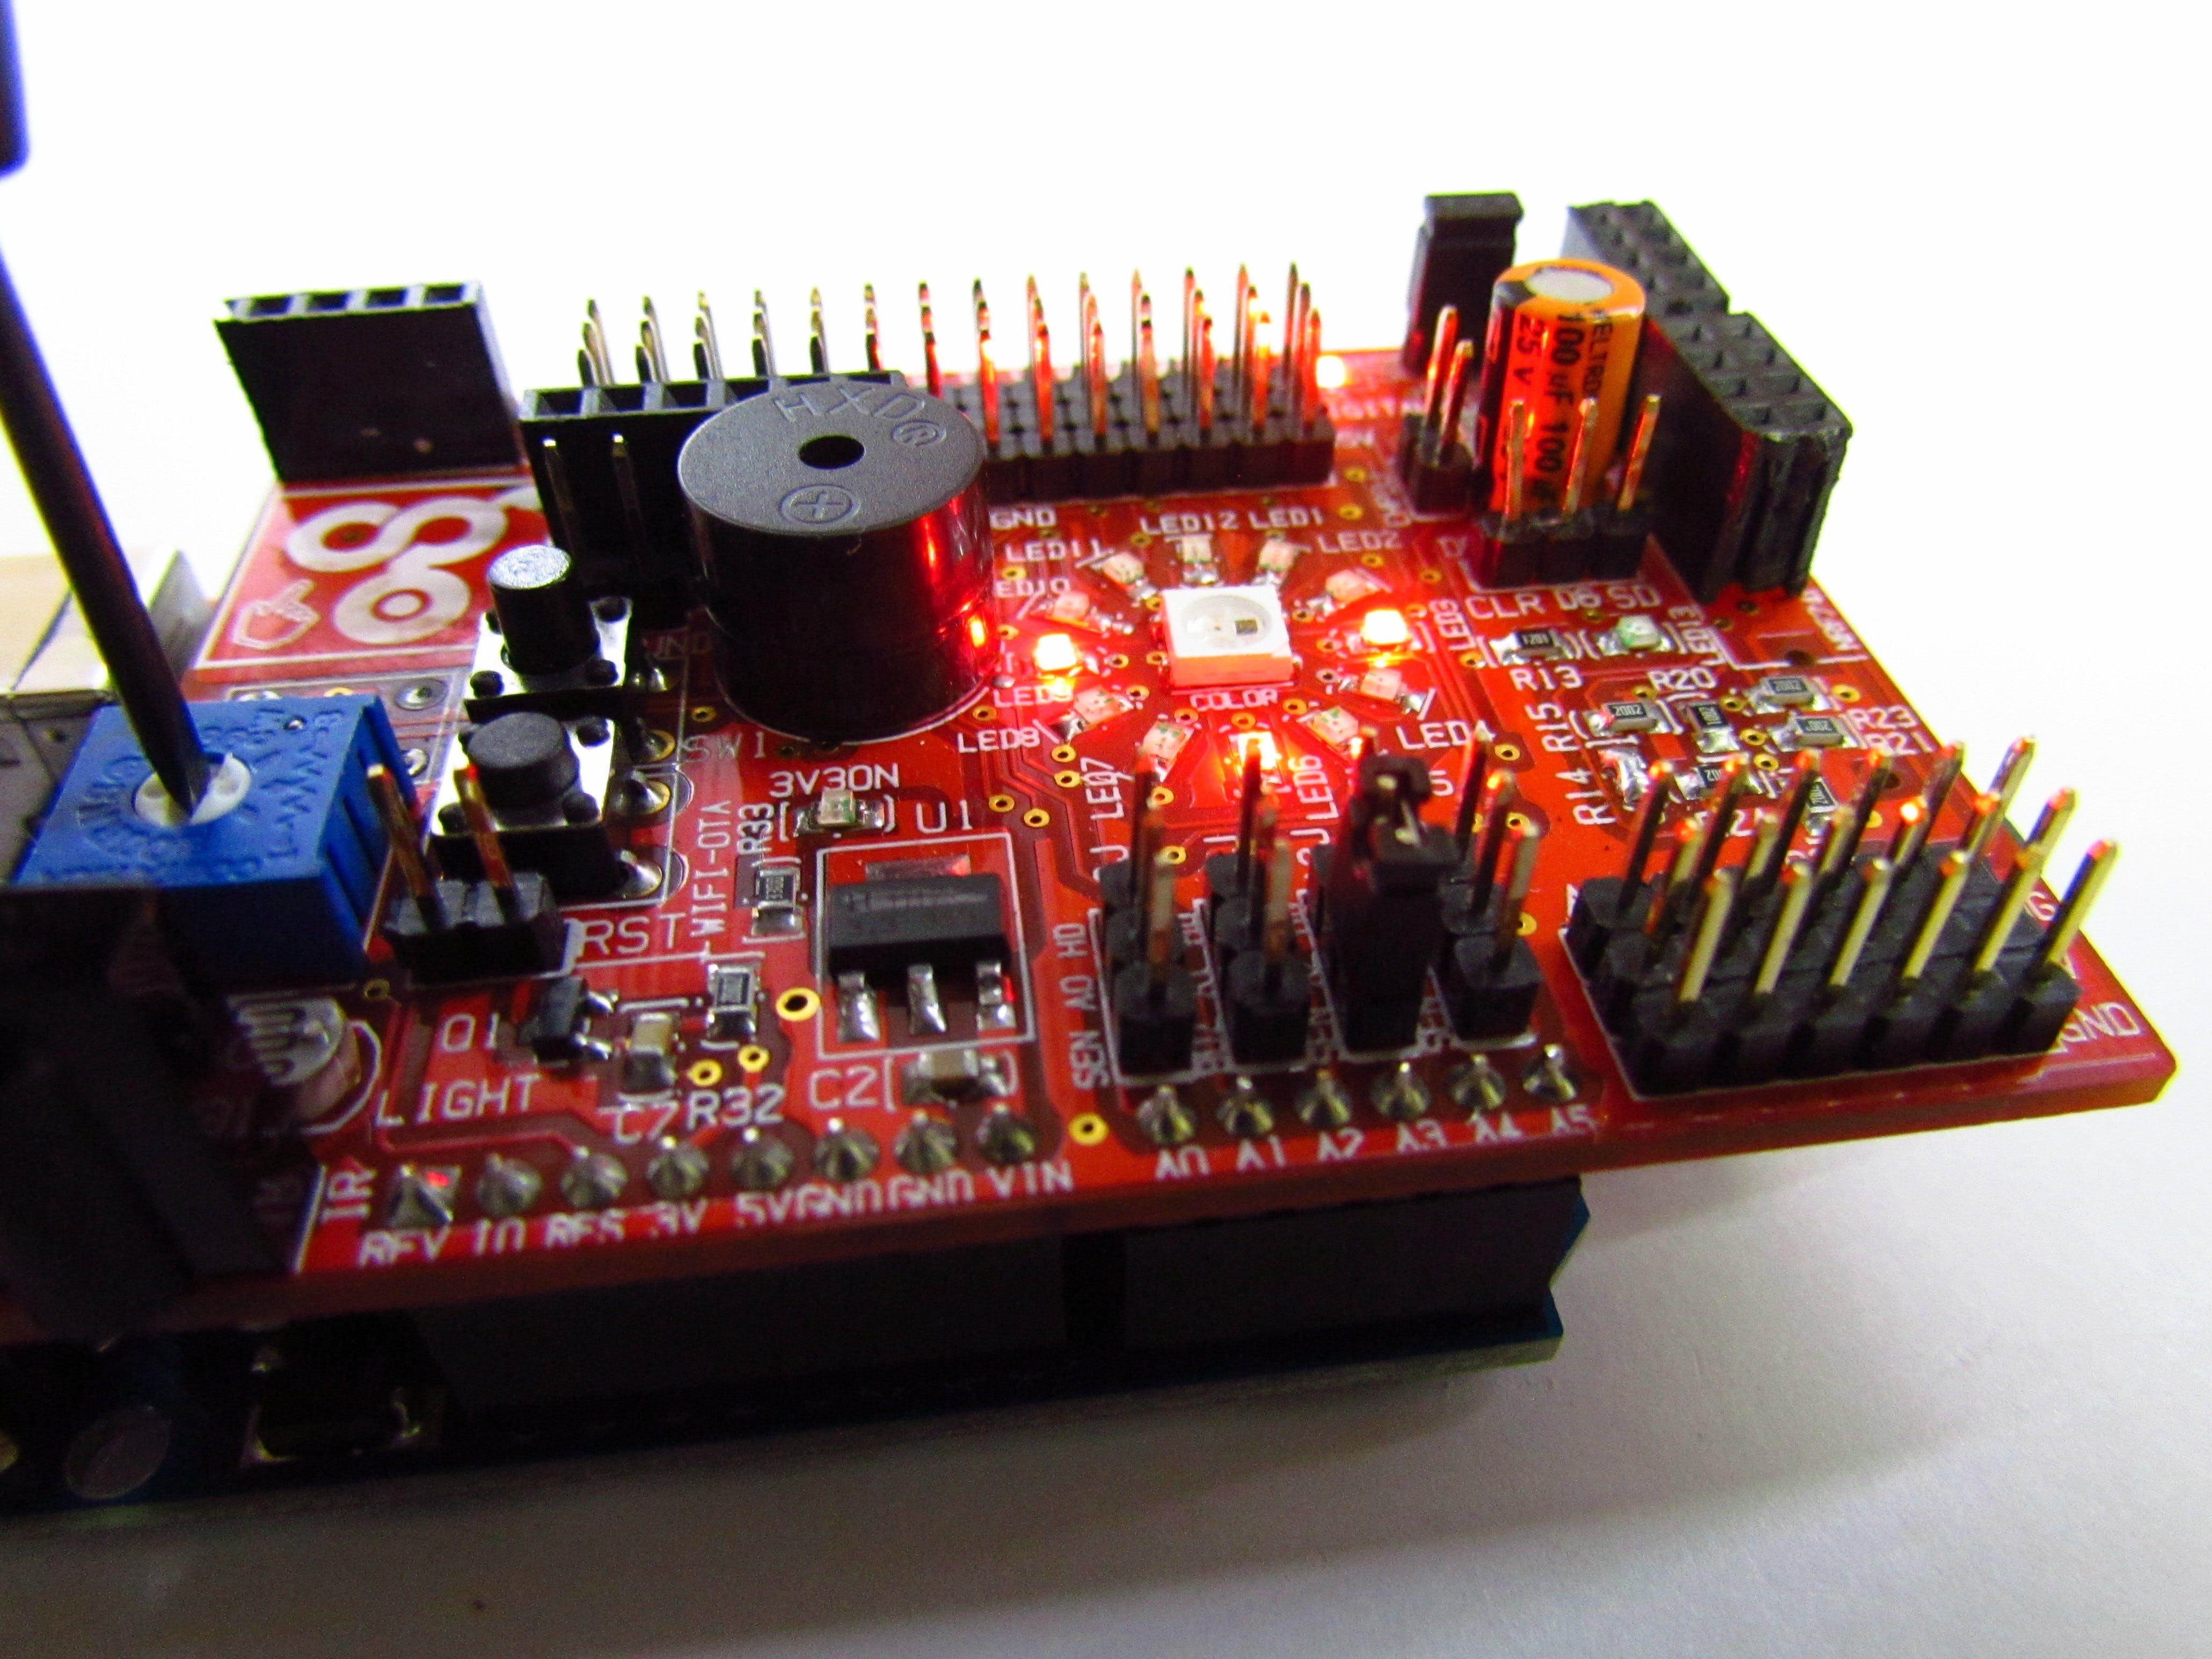 Pulse Width Modulation Using a Potentiometer